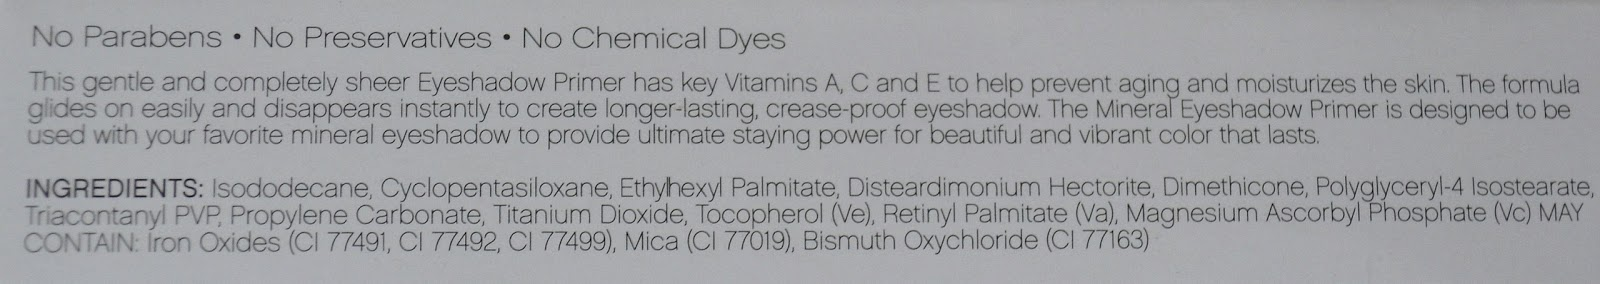 praimer, e.l.f Mineral Eyeshadow Primer in Sheer